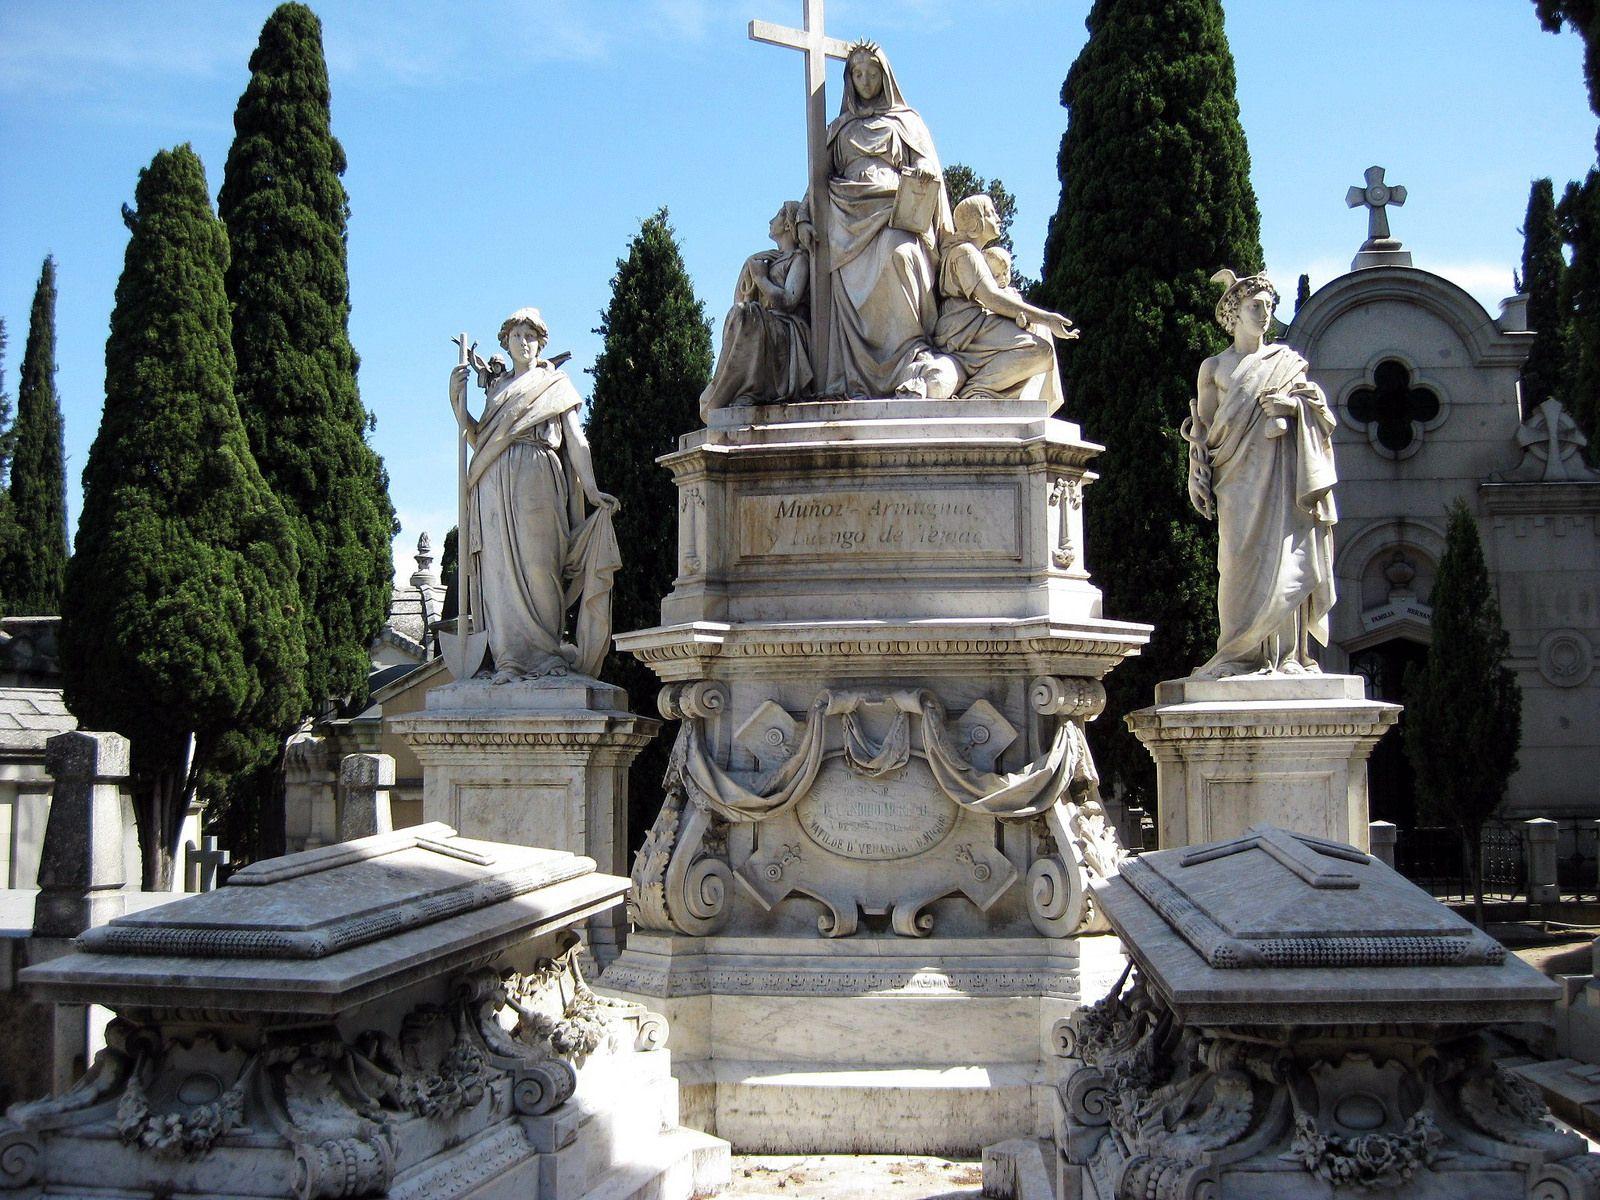 Cementerio Sacramental San Isidro y San Andres 1811-1842 Madrid (202) | by Ruben Juan